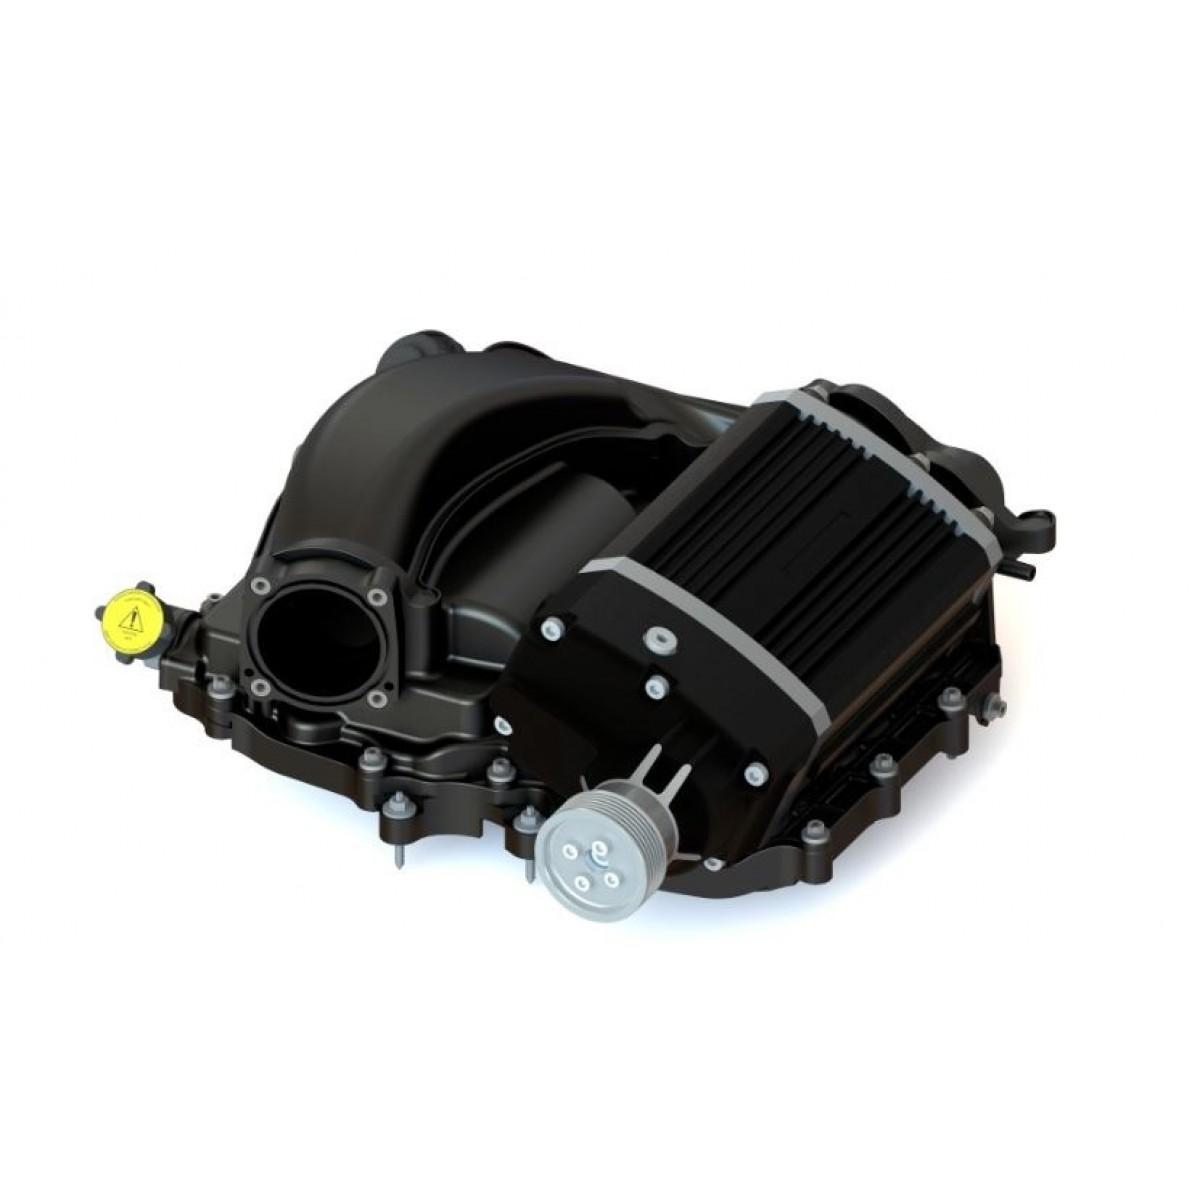 Sprintex Jeep Jk 3 6l V6 Mechanical